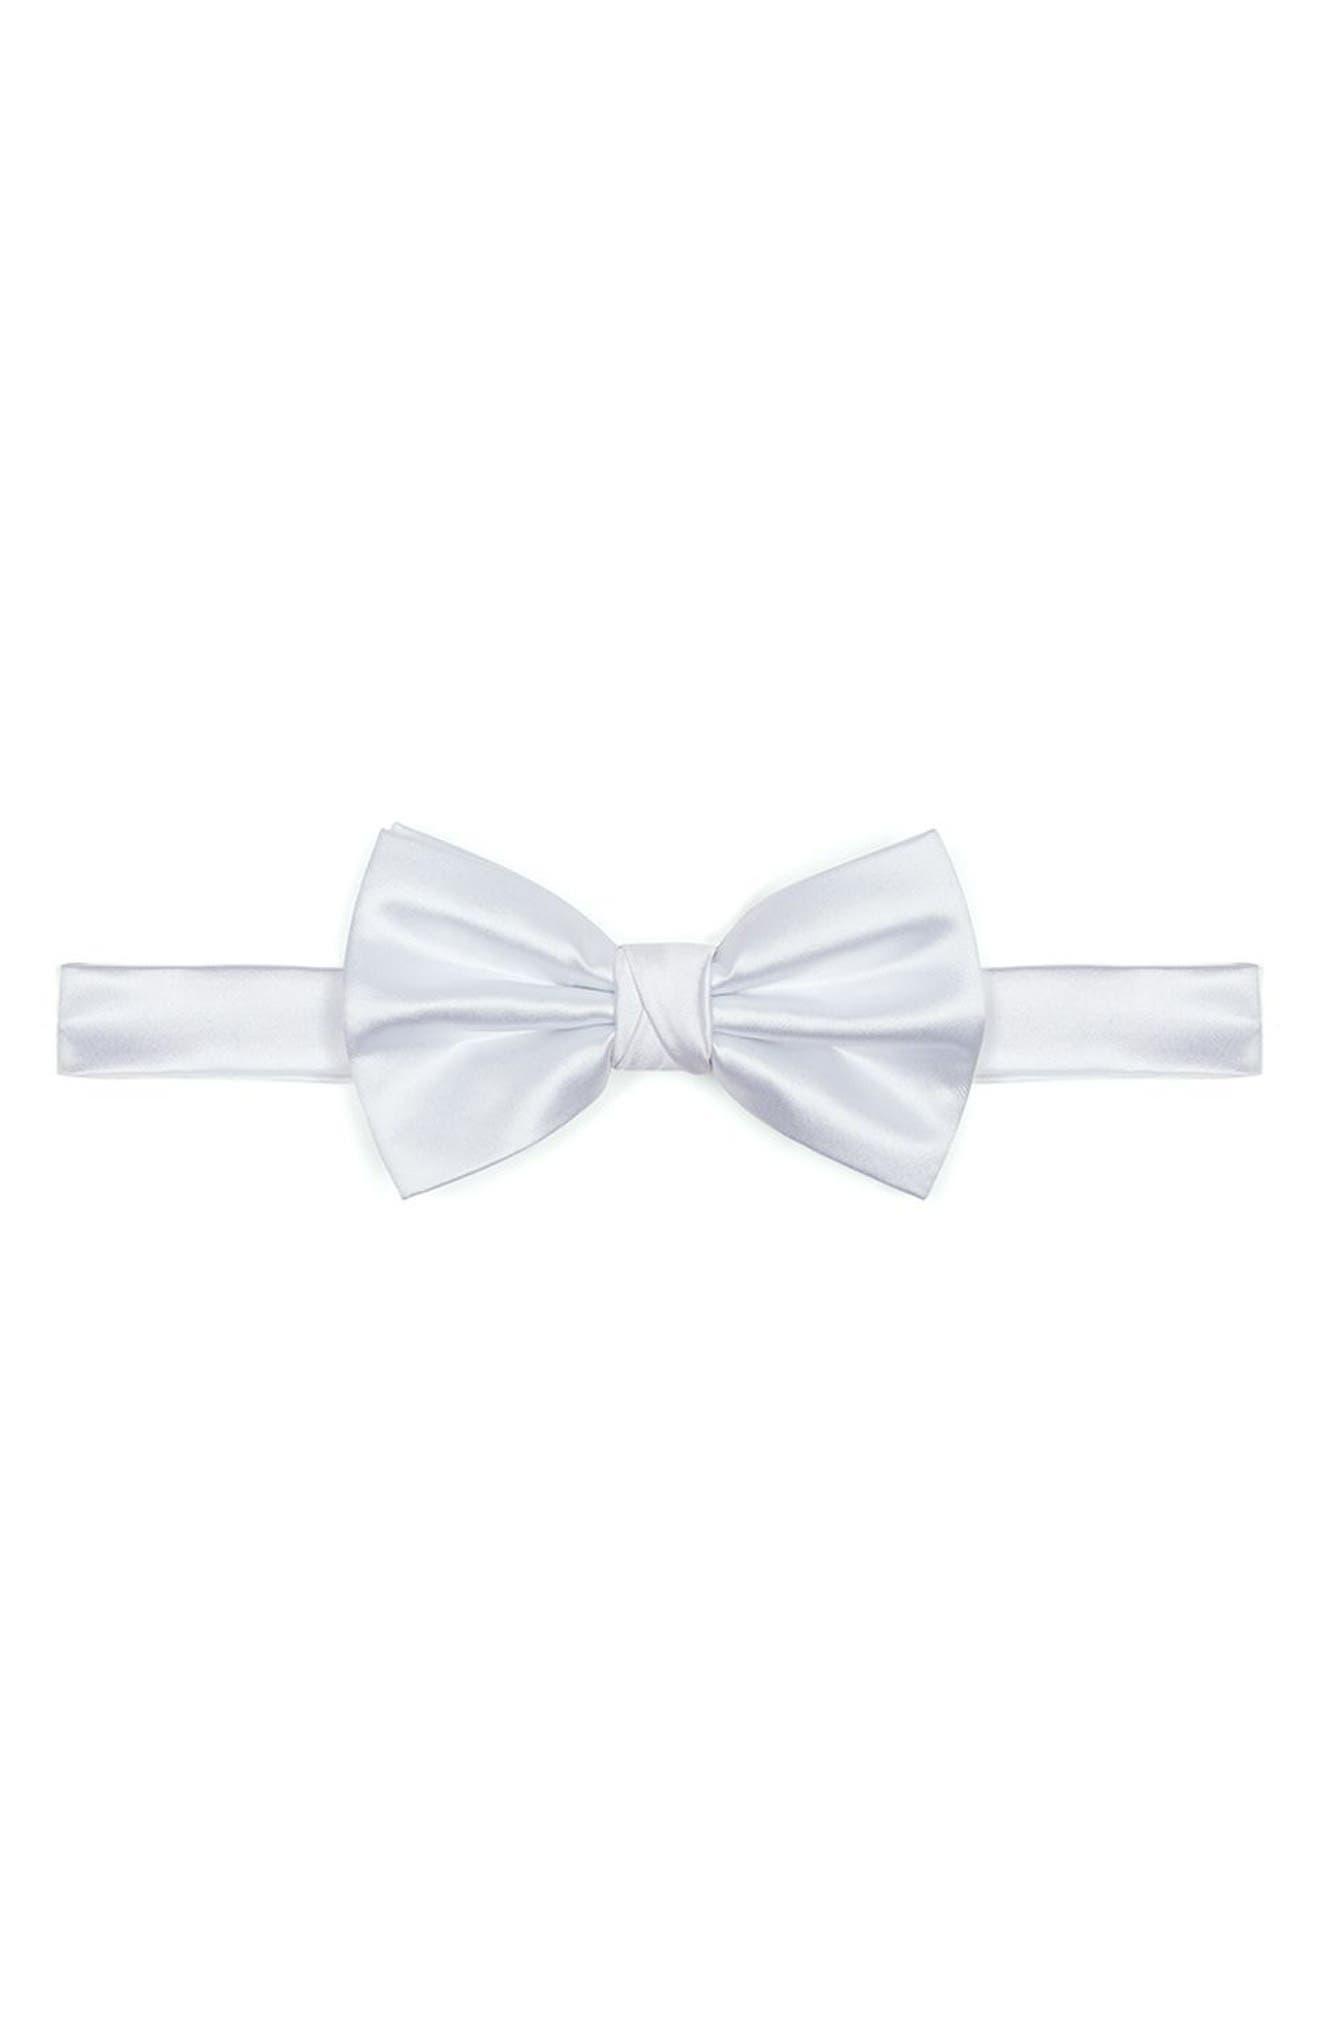 Twill Bow Tie,                         Main,                         color, White